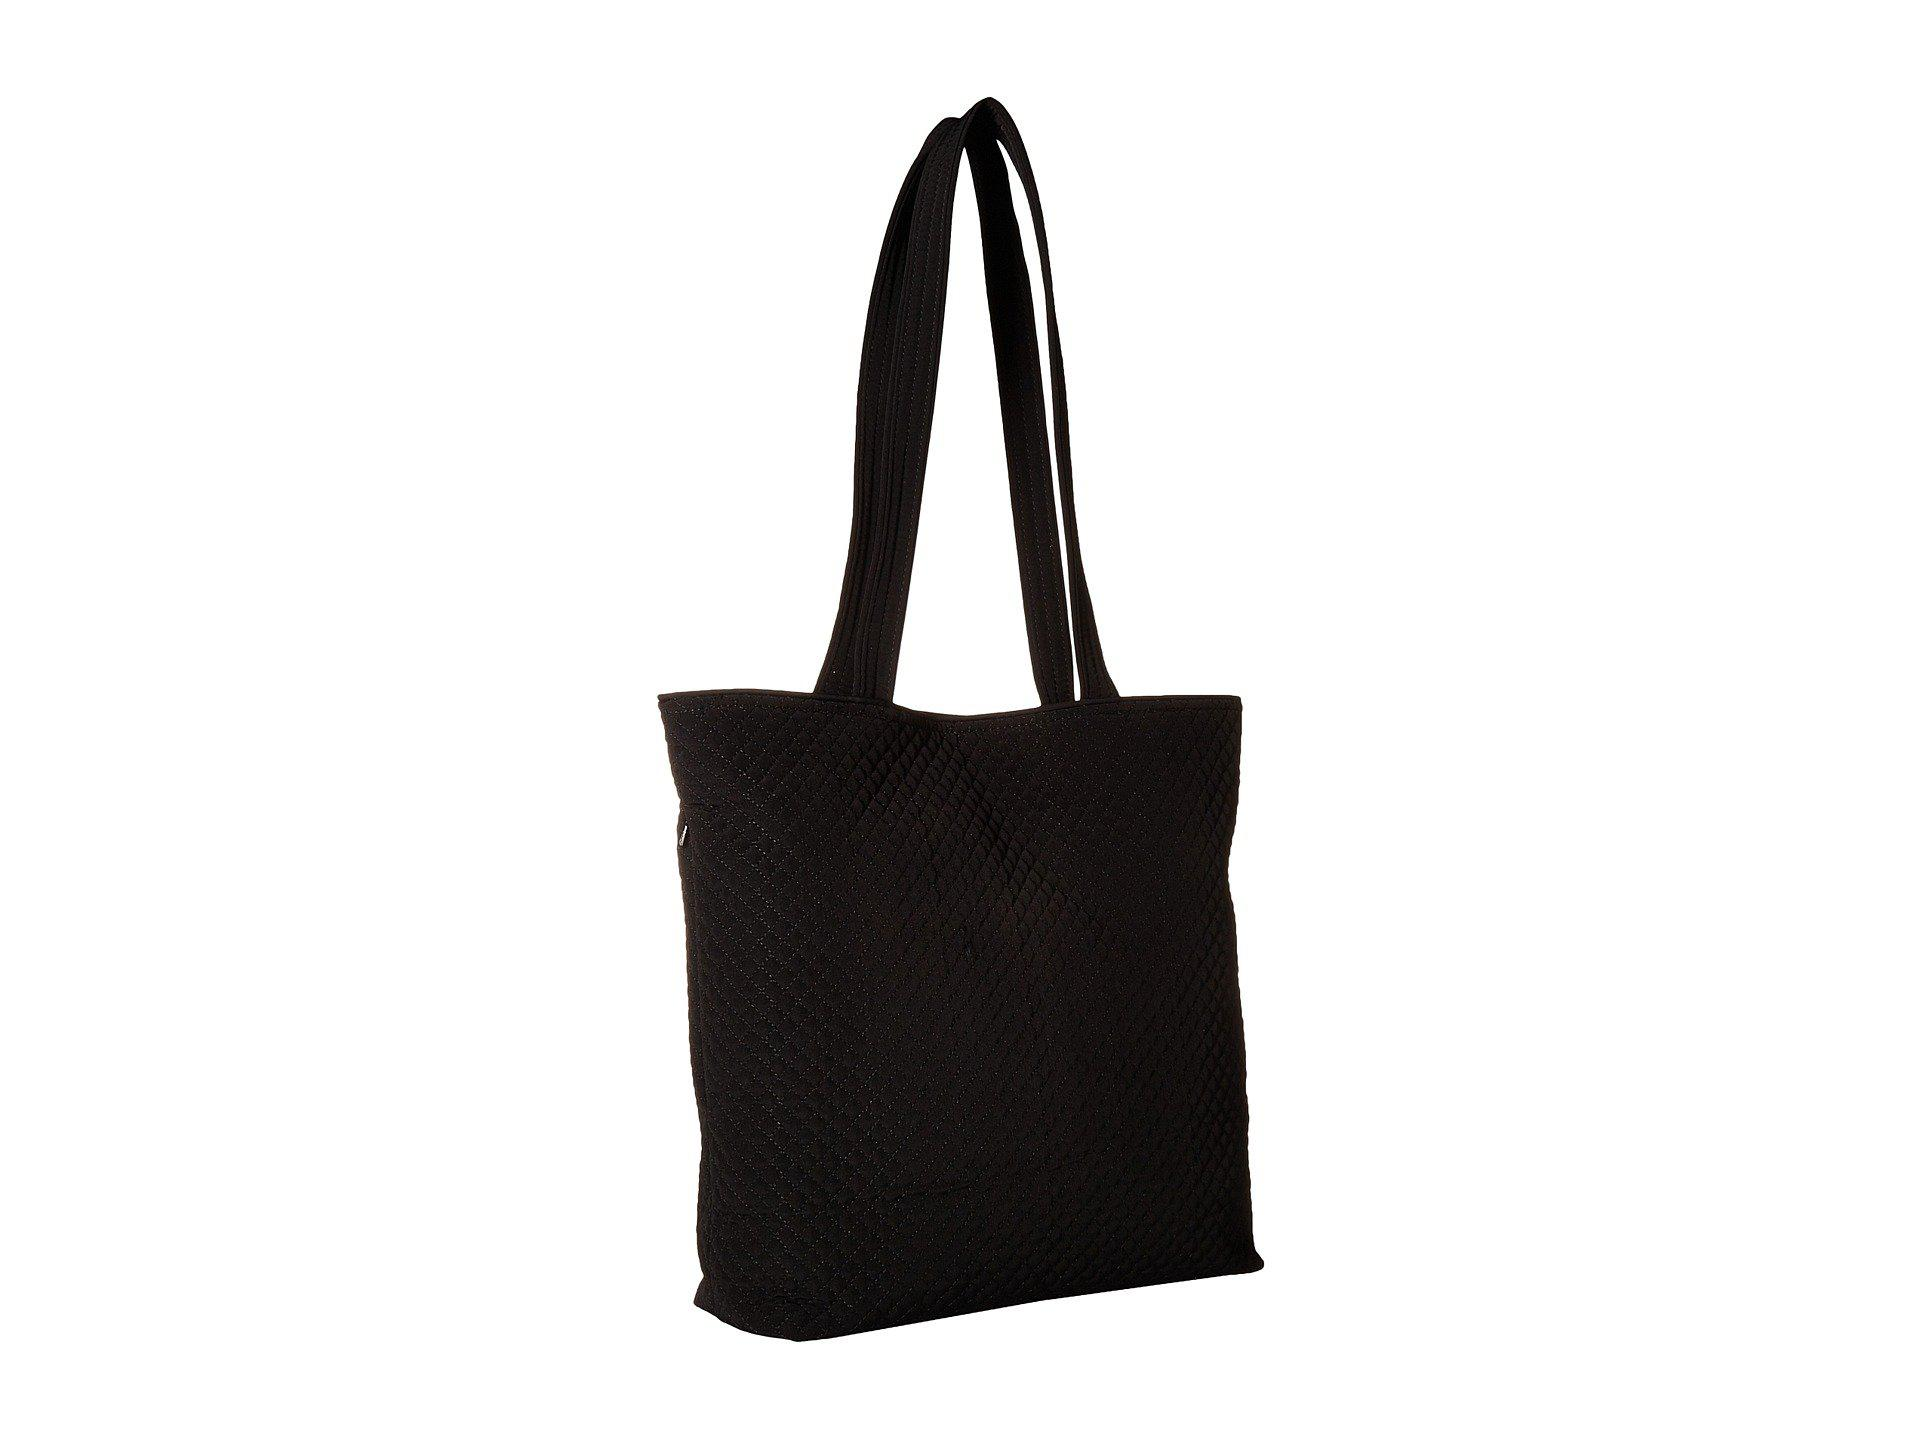 Lyst - Vera Bradley Iconic Tote Bag (classic Black) Tote Handbags in ... 2297041ef7c85